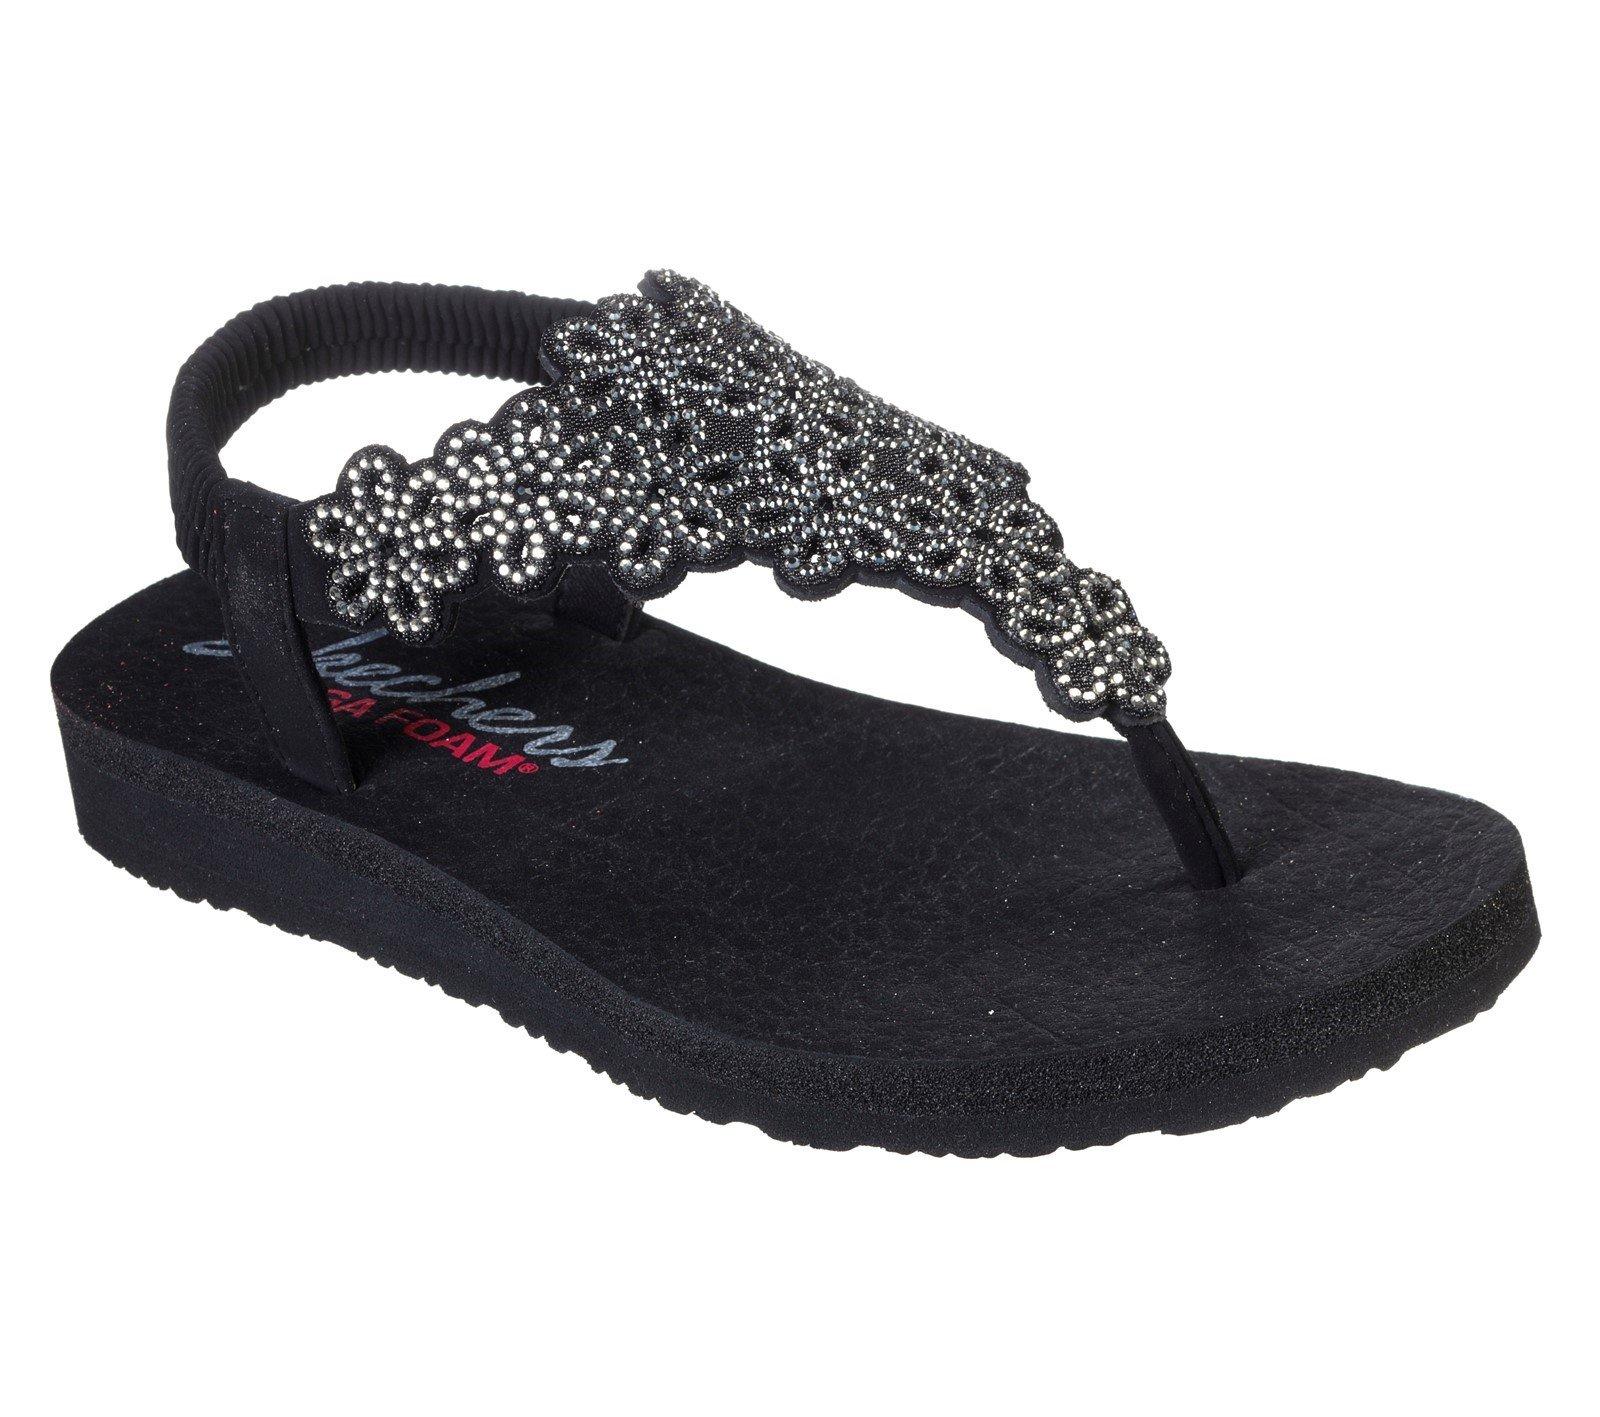 Skechers Women's Meditation Floral Summer Sandal Various Colours 32174 - Black/Silver 3